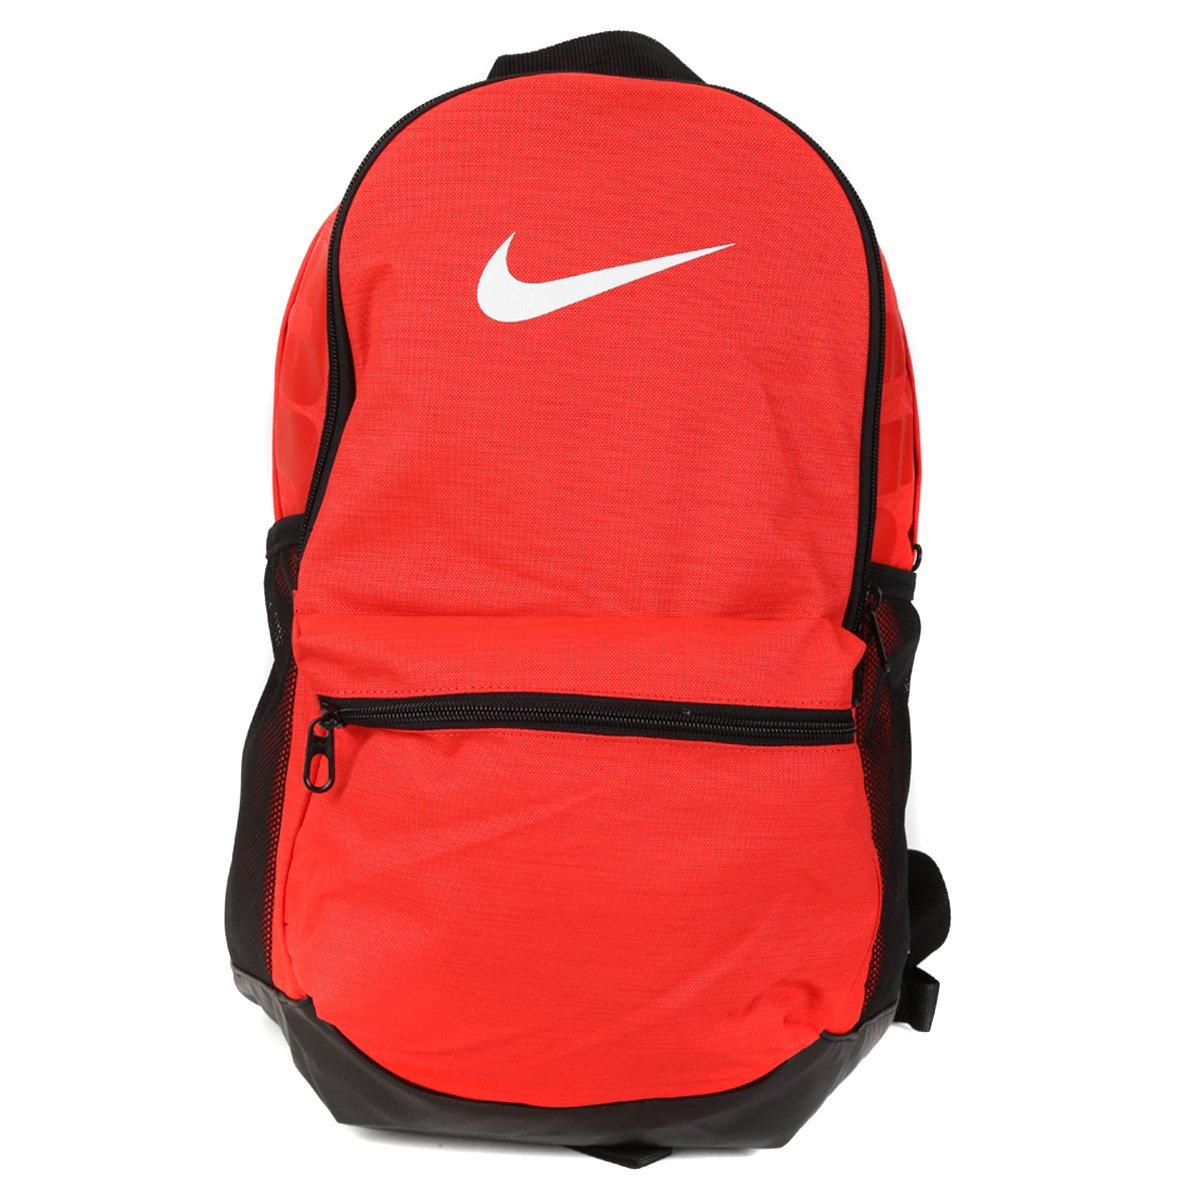 Mochila Nike Brasília - Laranja e Preto - Compre Agora  9d909aae70f61